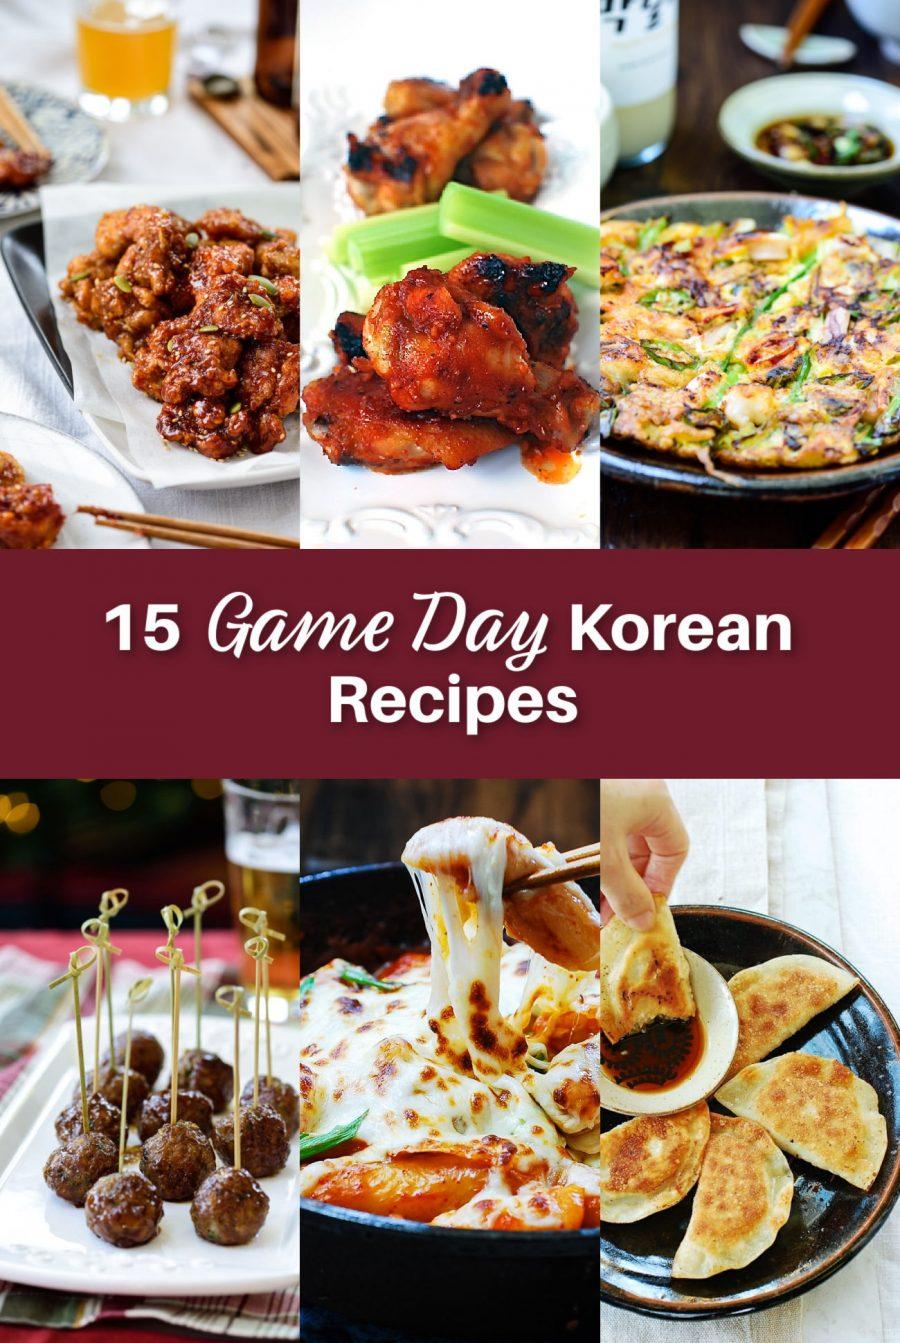 15 Game Day Korean Recipes e1612496393876 - 15 Game Day Korean Recipes